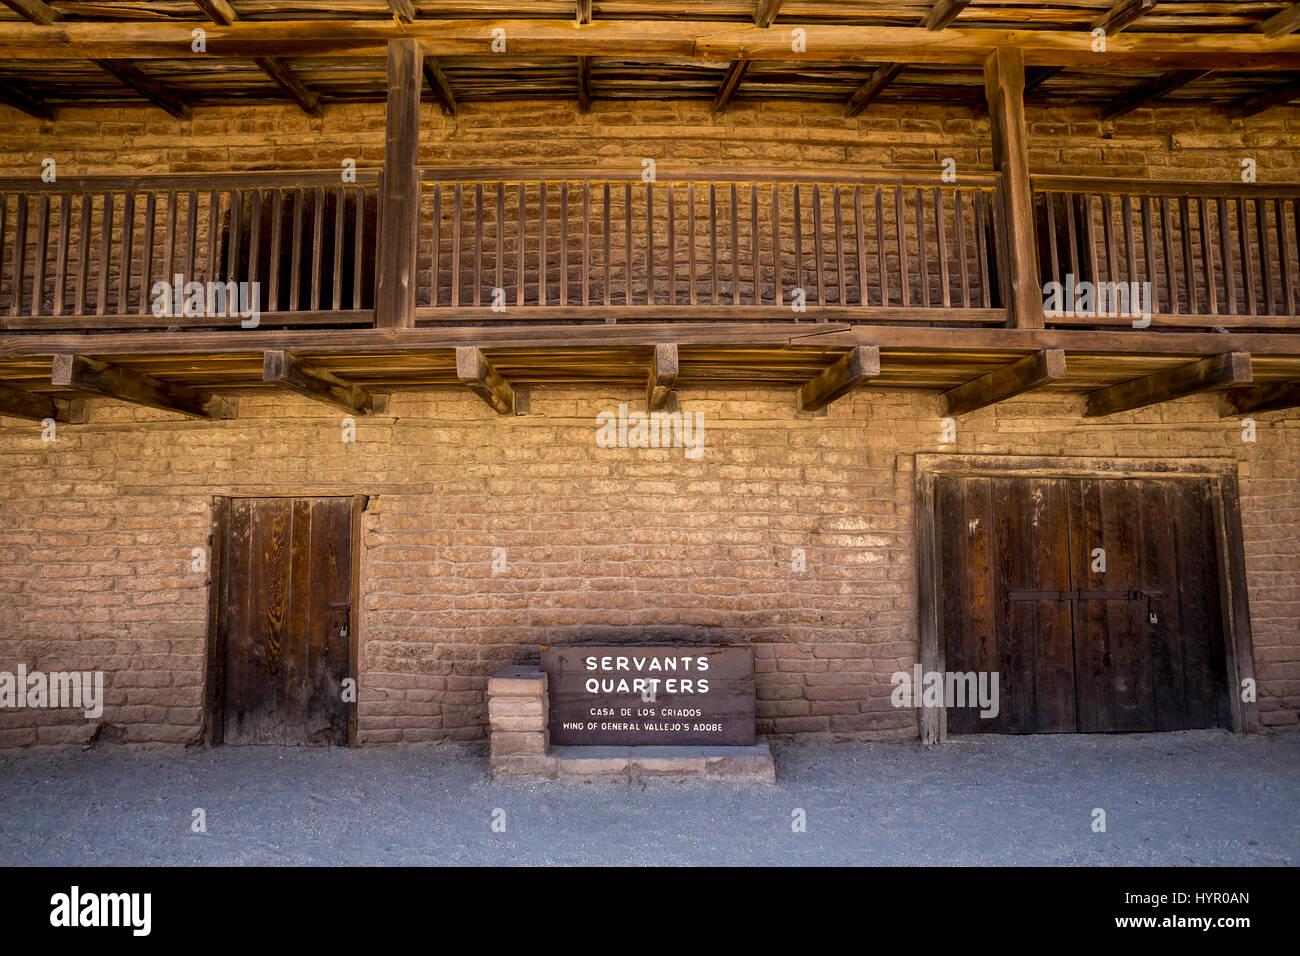 Servants Quarters, Casa de los Criados, Wing of General Vallejo's Adobe, city of Sonoma, Sonoma, Sonoma County, - Stock Image